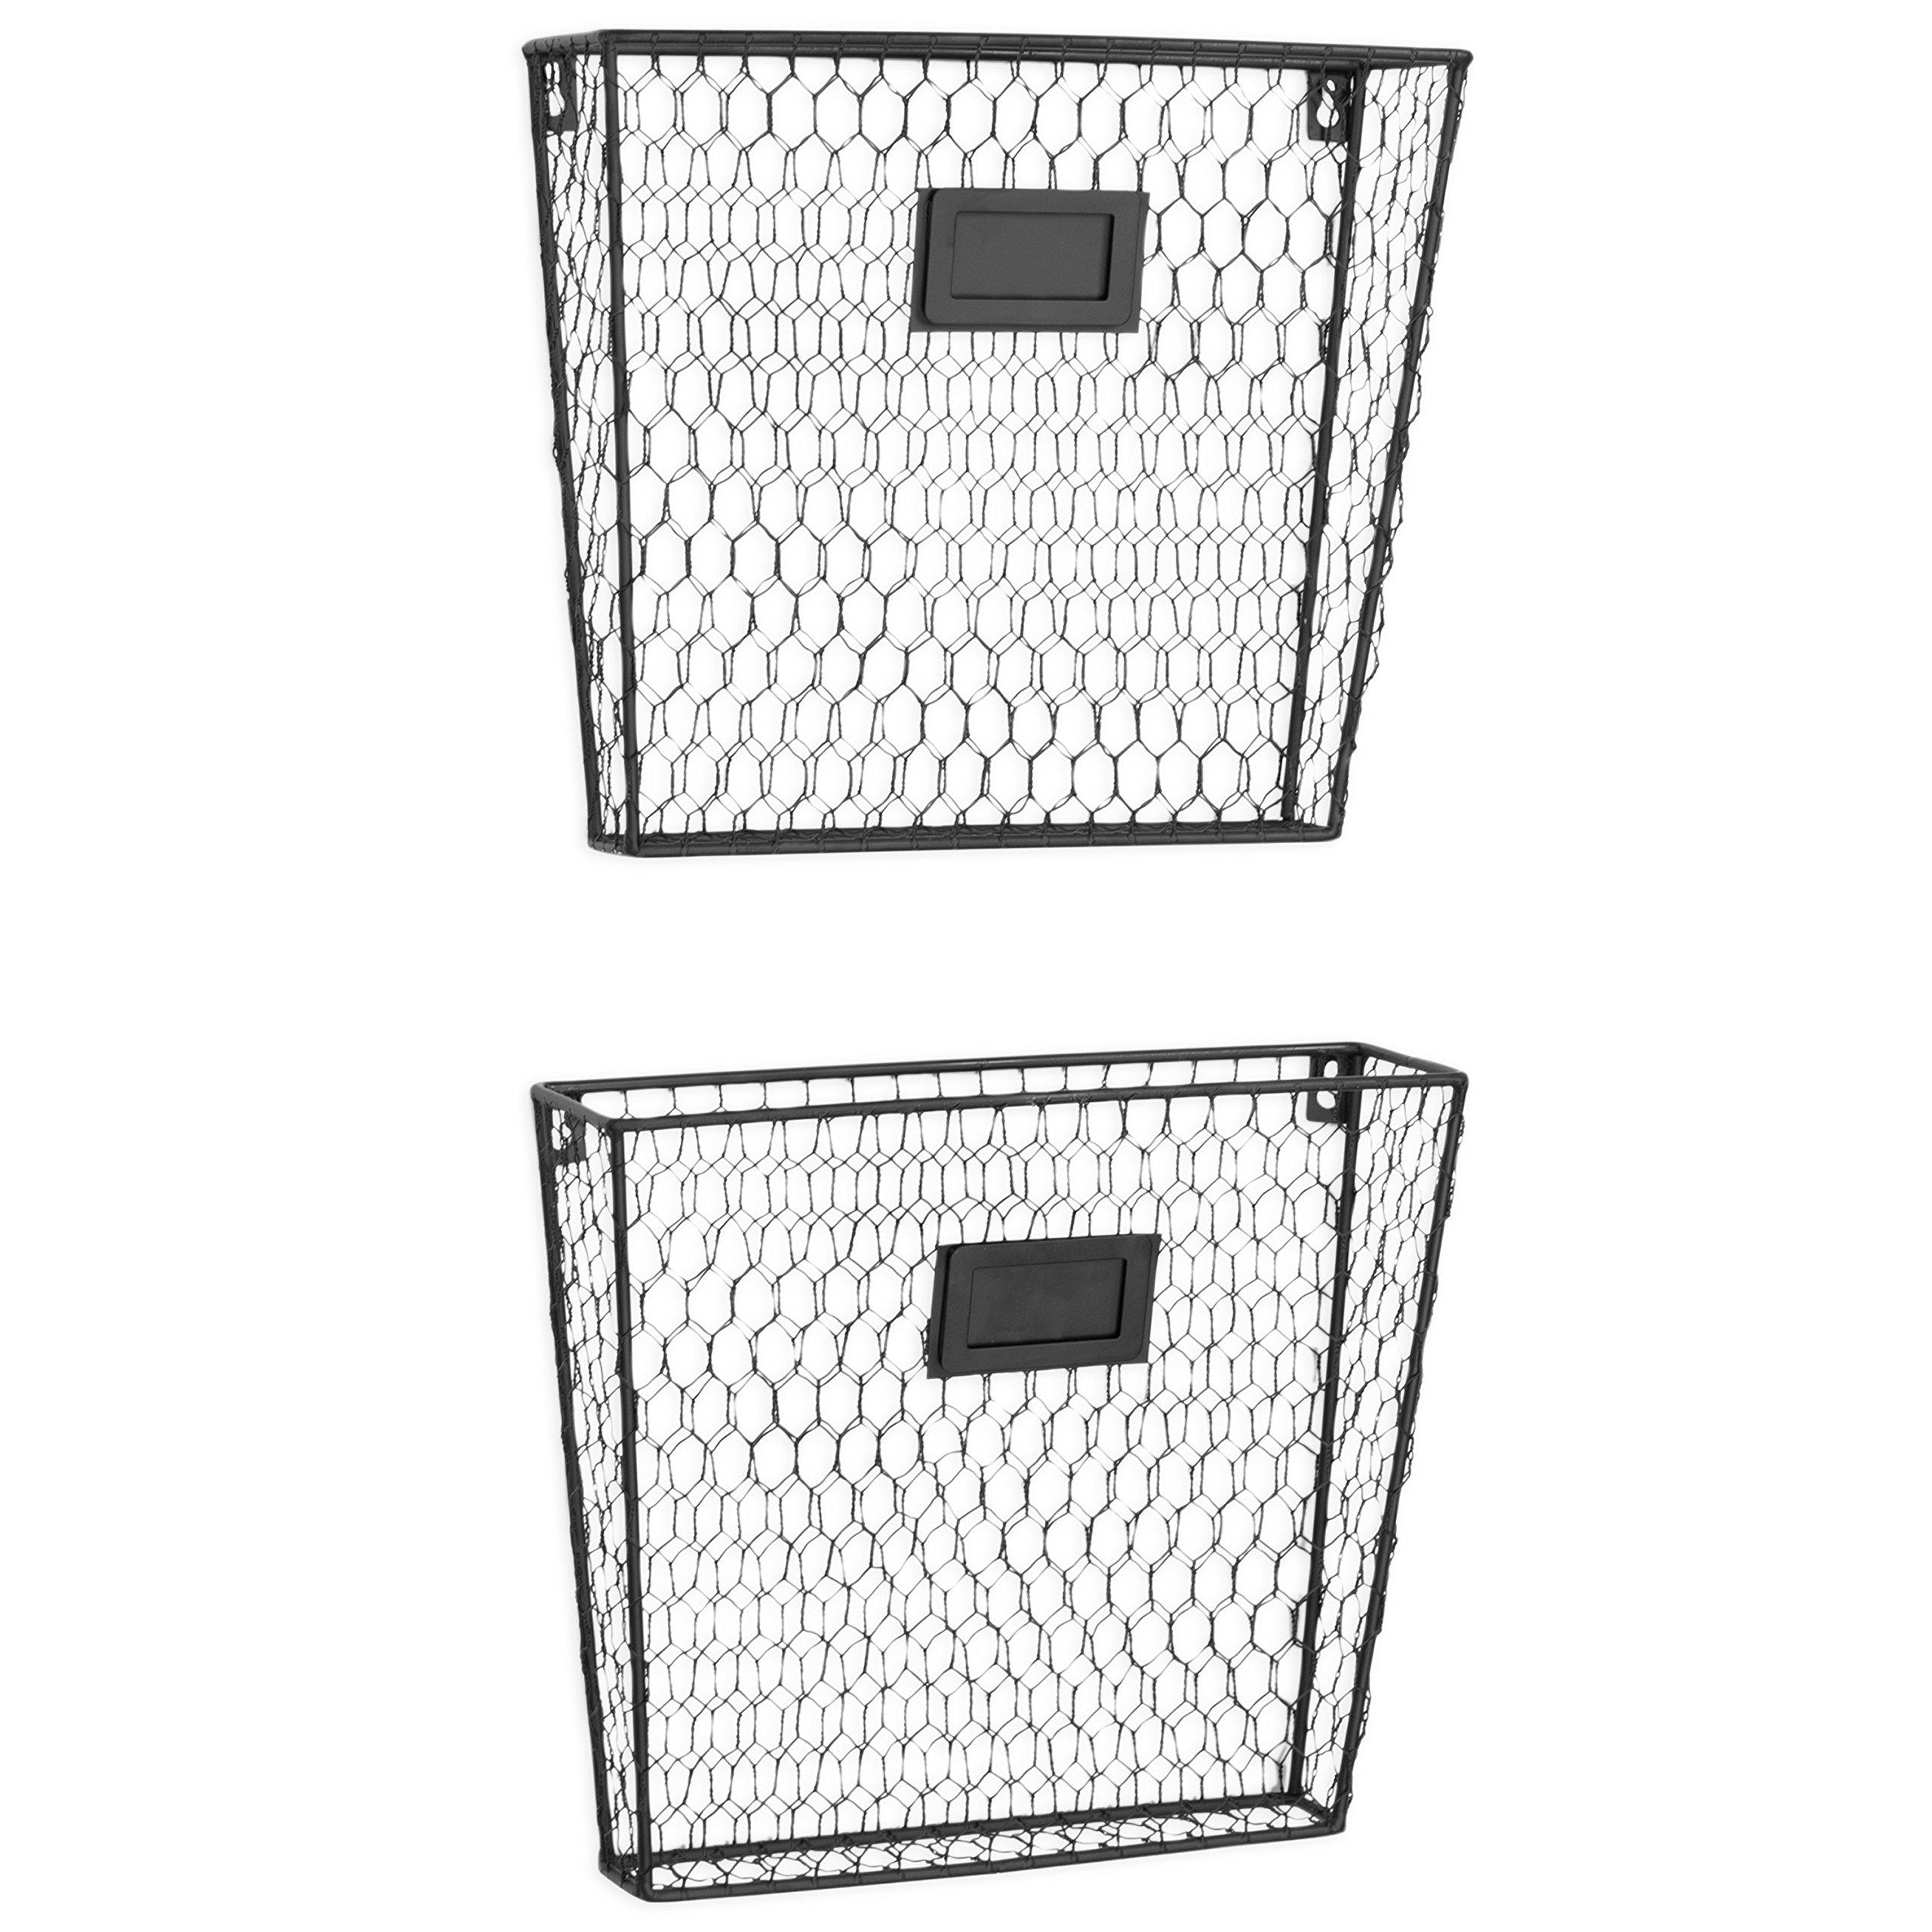 MyGift Rustic Chicken Wire Wall-Mounted Magazine & File Folder Baskets w/Chalkboard Label Inserts, Set of 2 by MyGift (Image #2)